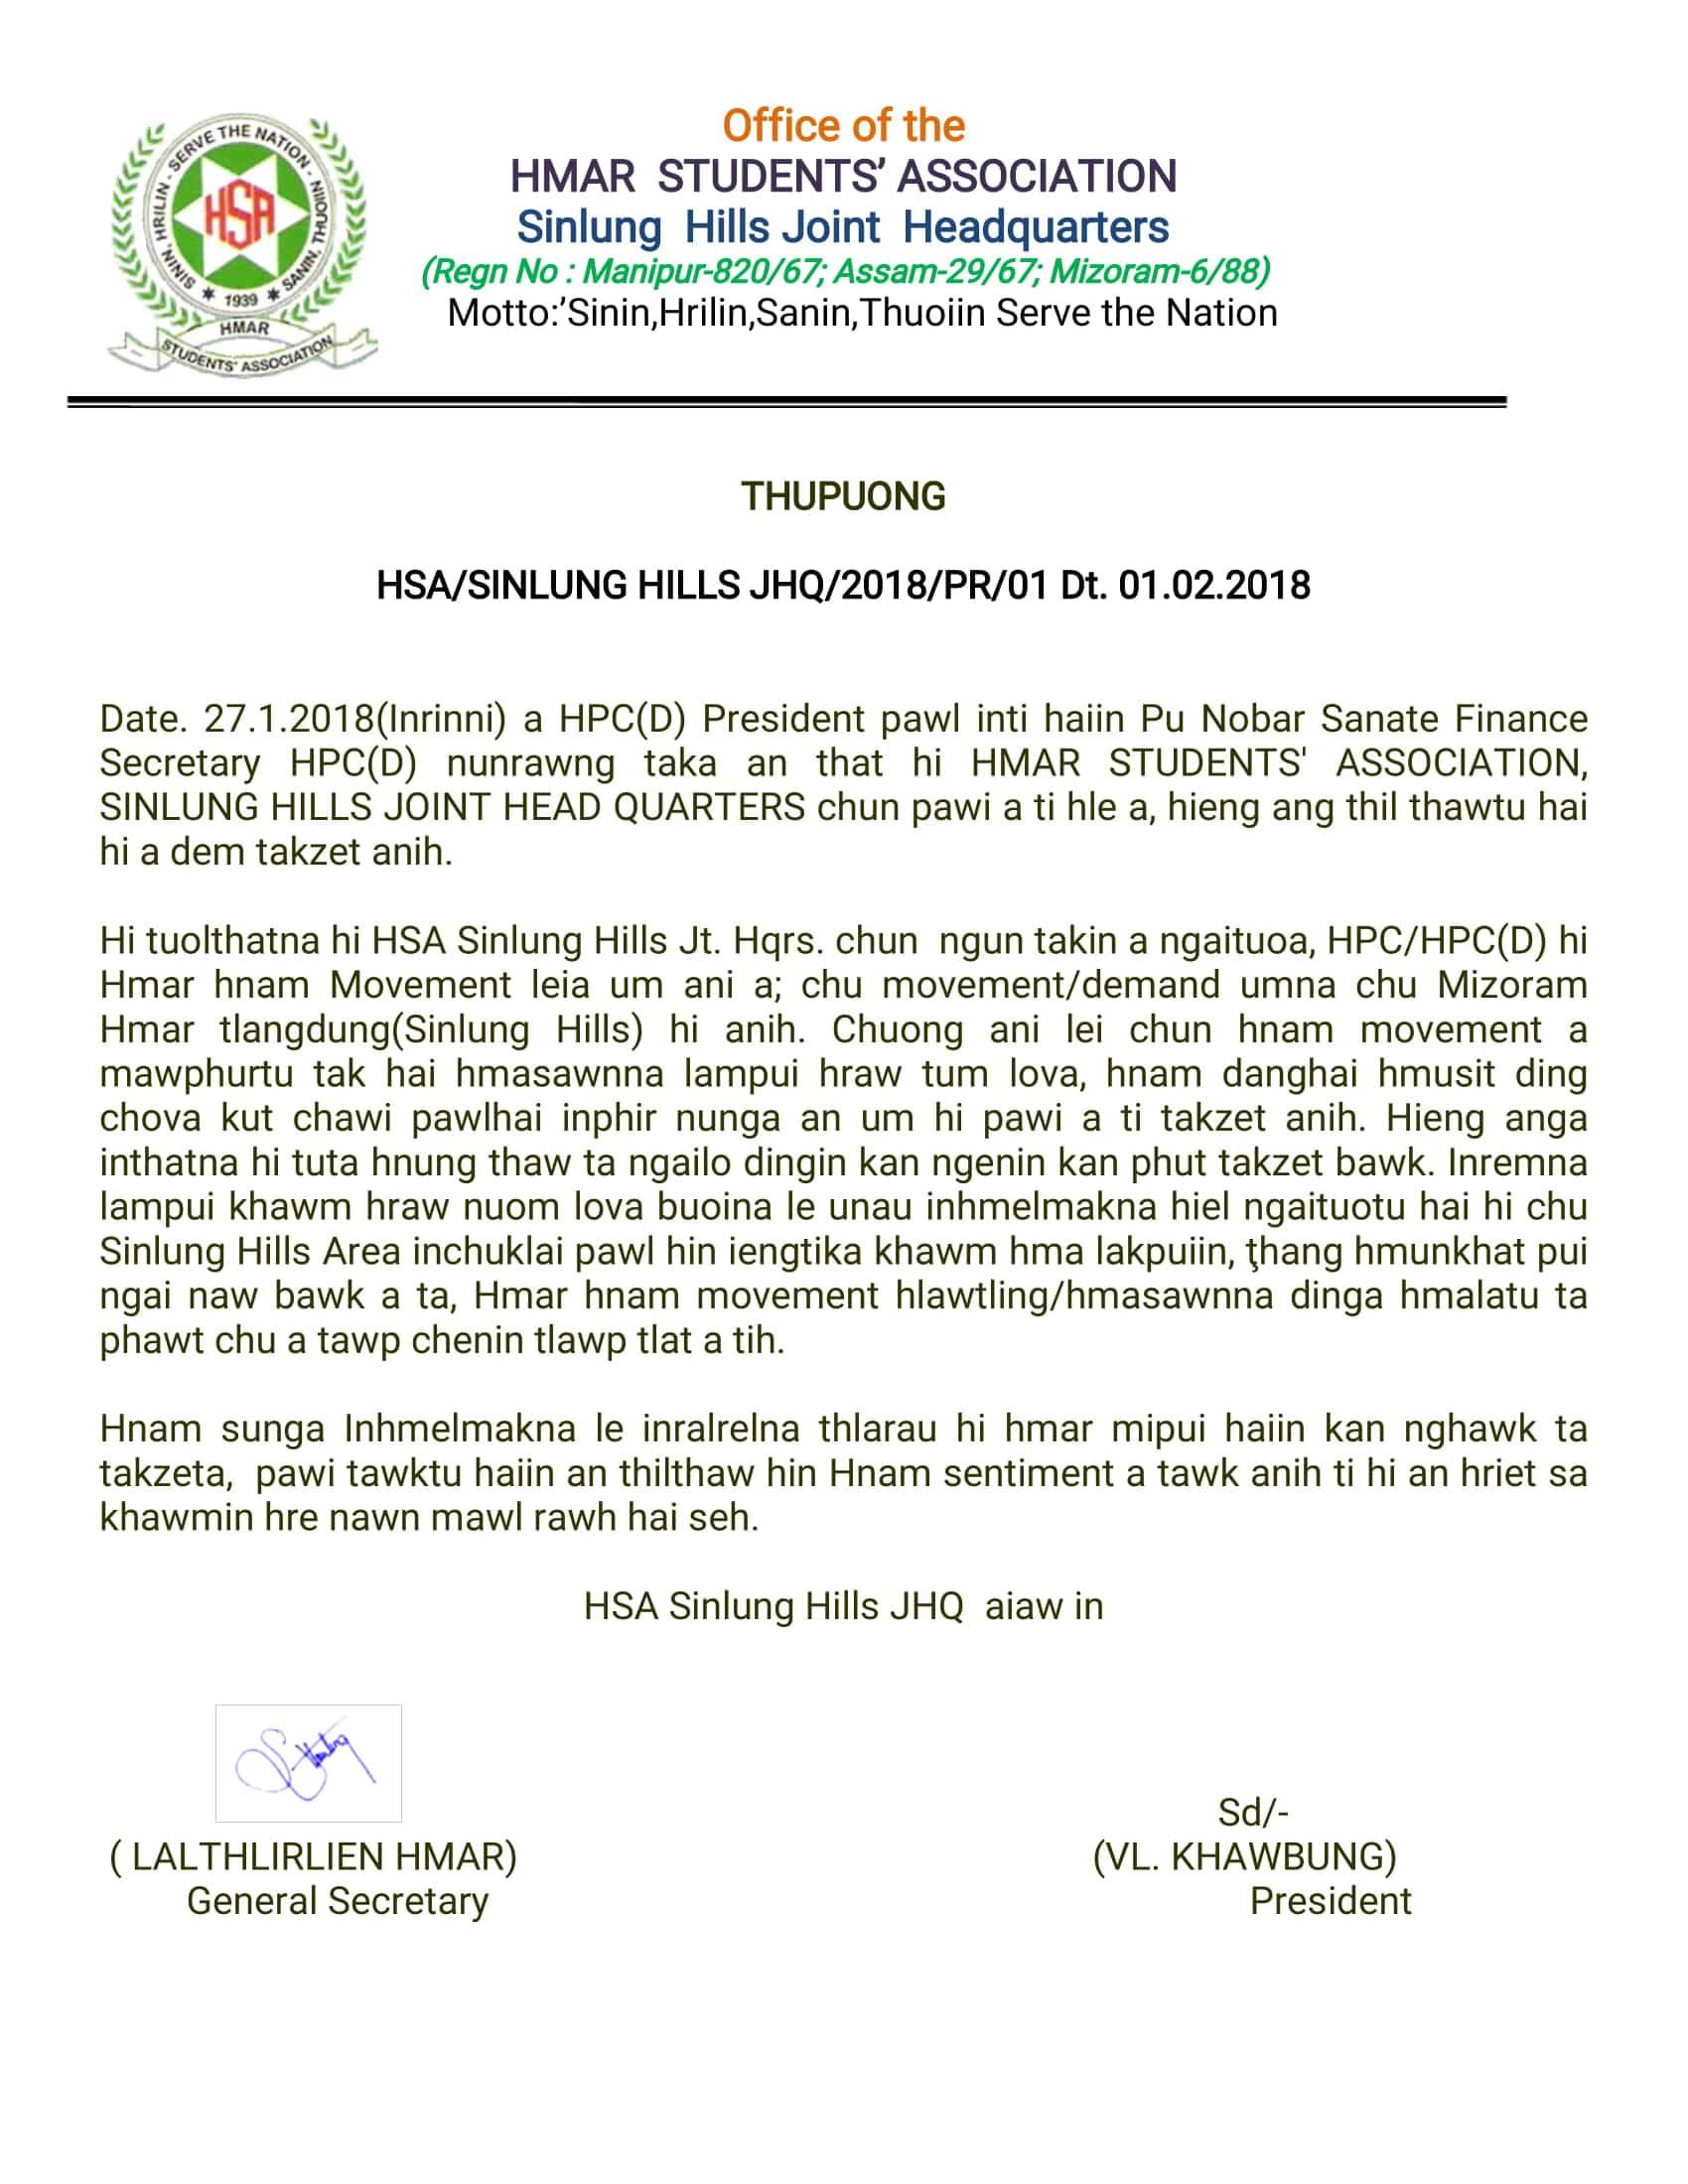 Pu Nobar Sanate thina le inzawma HSA Sinlung Hills JHQ Thupuong